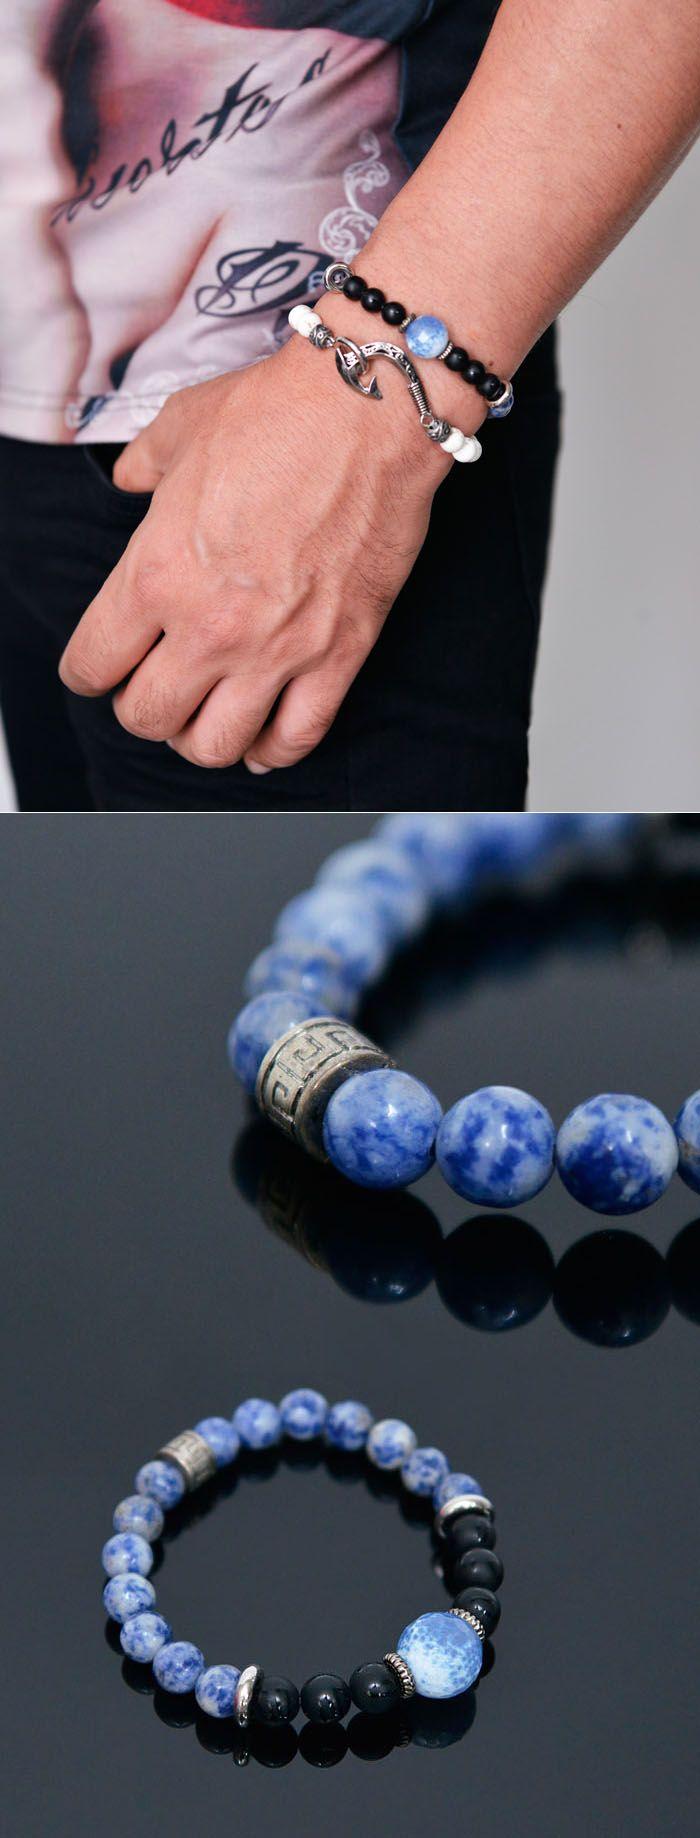 Blue Moon Sodalite Beads-Bracelet 377  by Guylook.com  #blue #bracelet #summer #accessories #style #stylish #cool #남자 #패션 #스타일